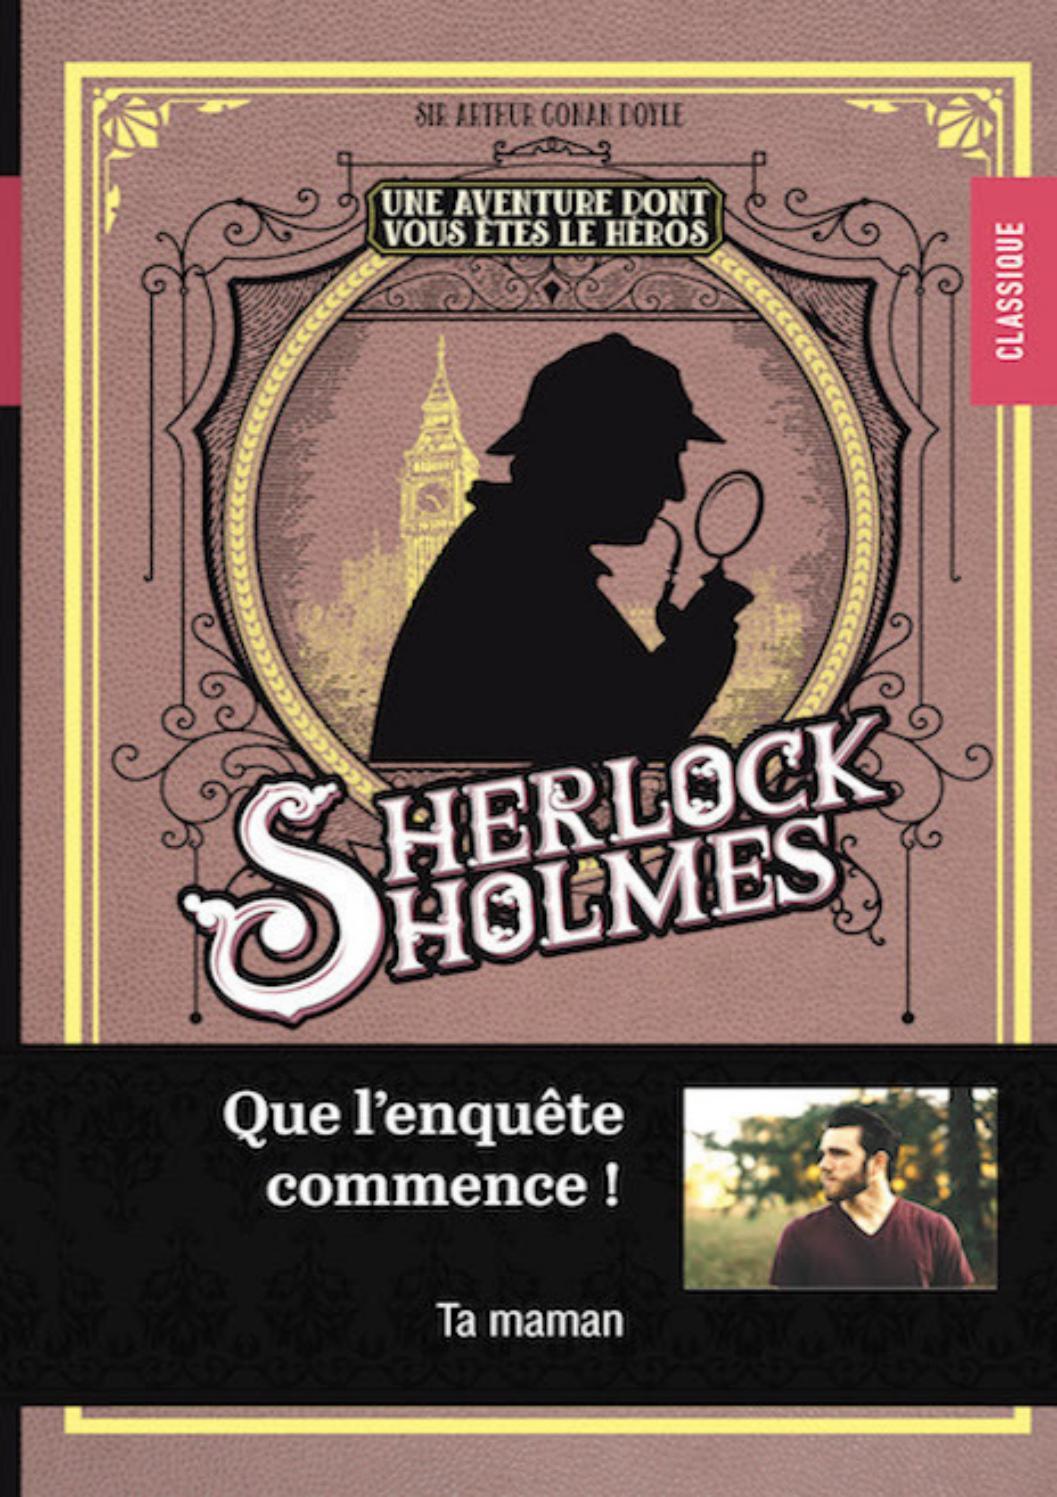 Sherlock Holmes Garçons Enfants Victorian Police Costume Robe Fantaisie Livre Jour